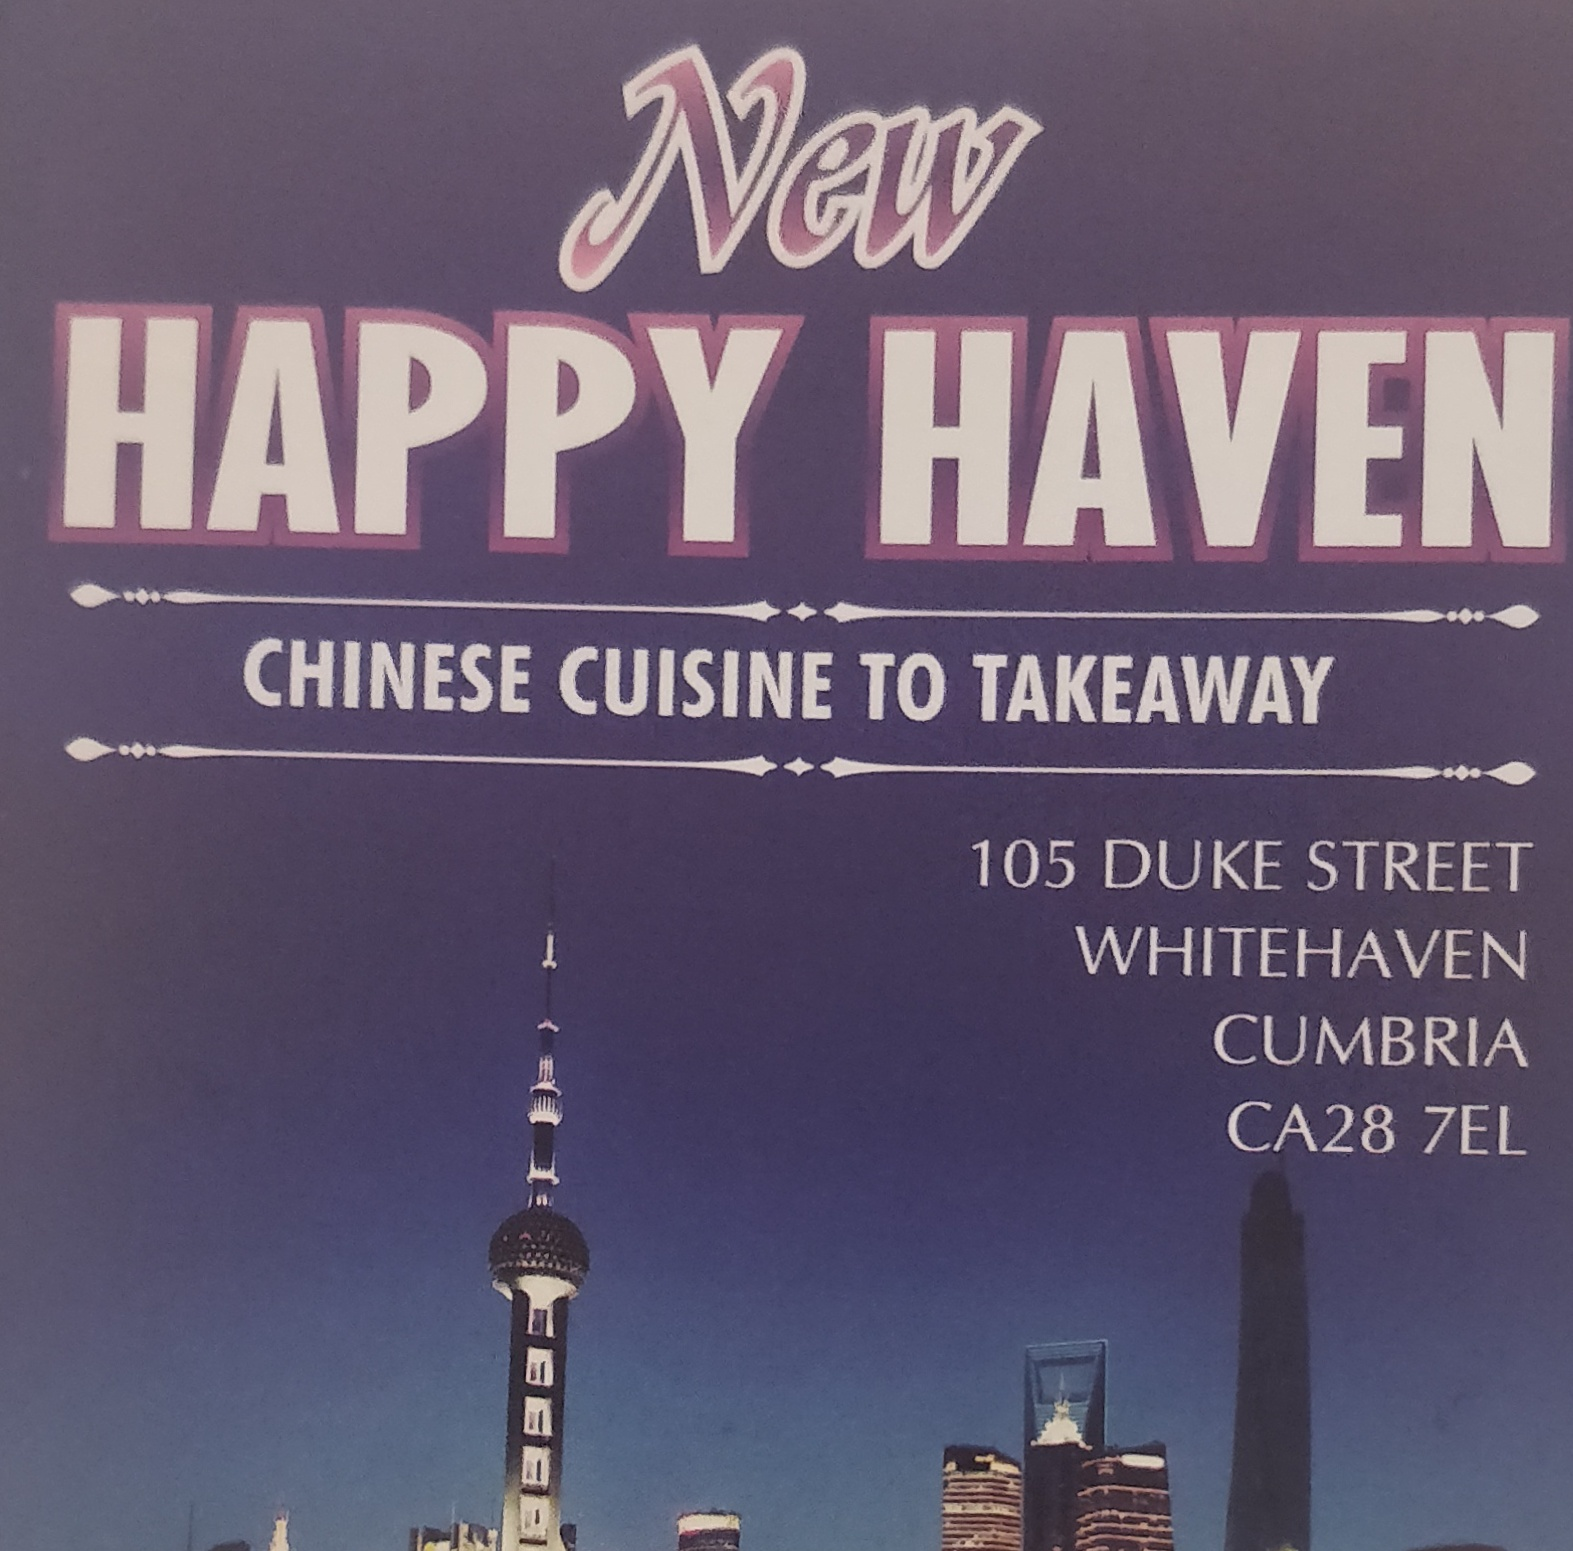 happy haven peking & chinese takeaway online menu